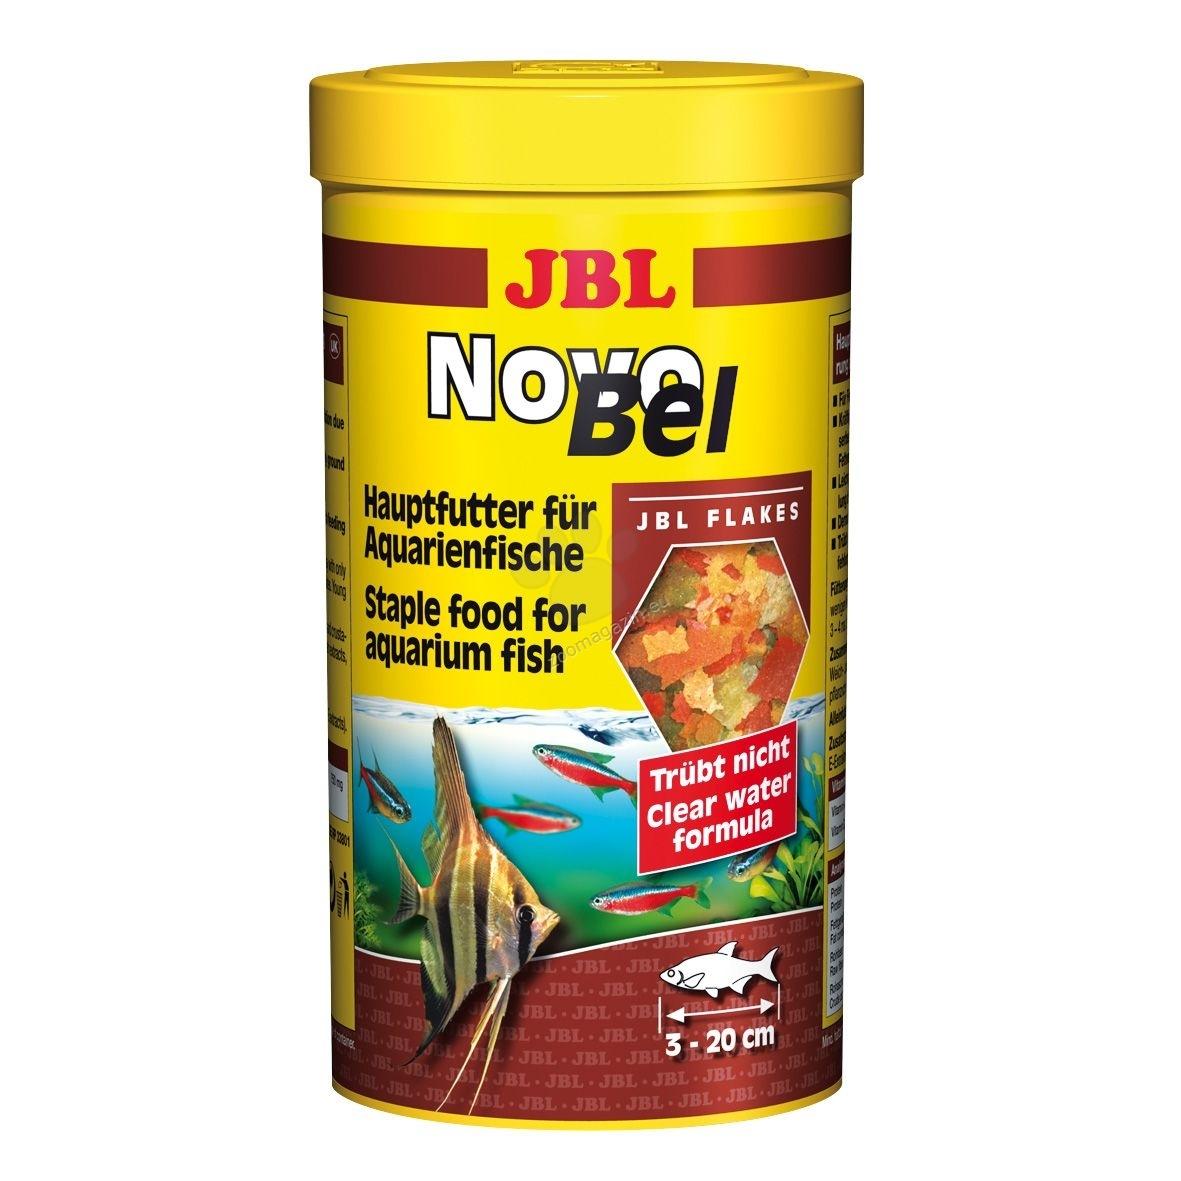 JBL NovoBel - βασική τροφή για όλα τα διακοσμητικά ψάρια - 1000 ml